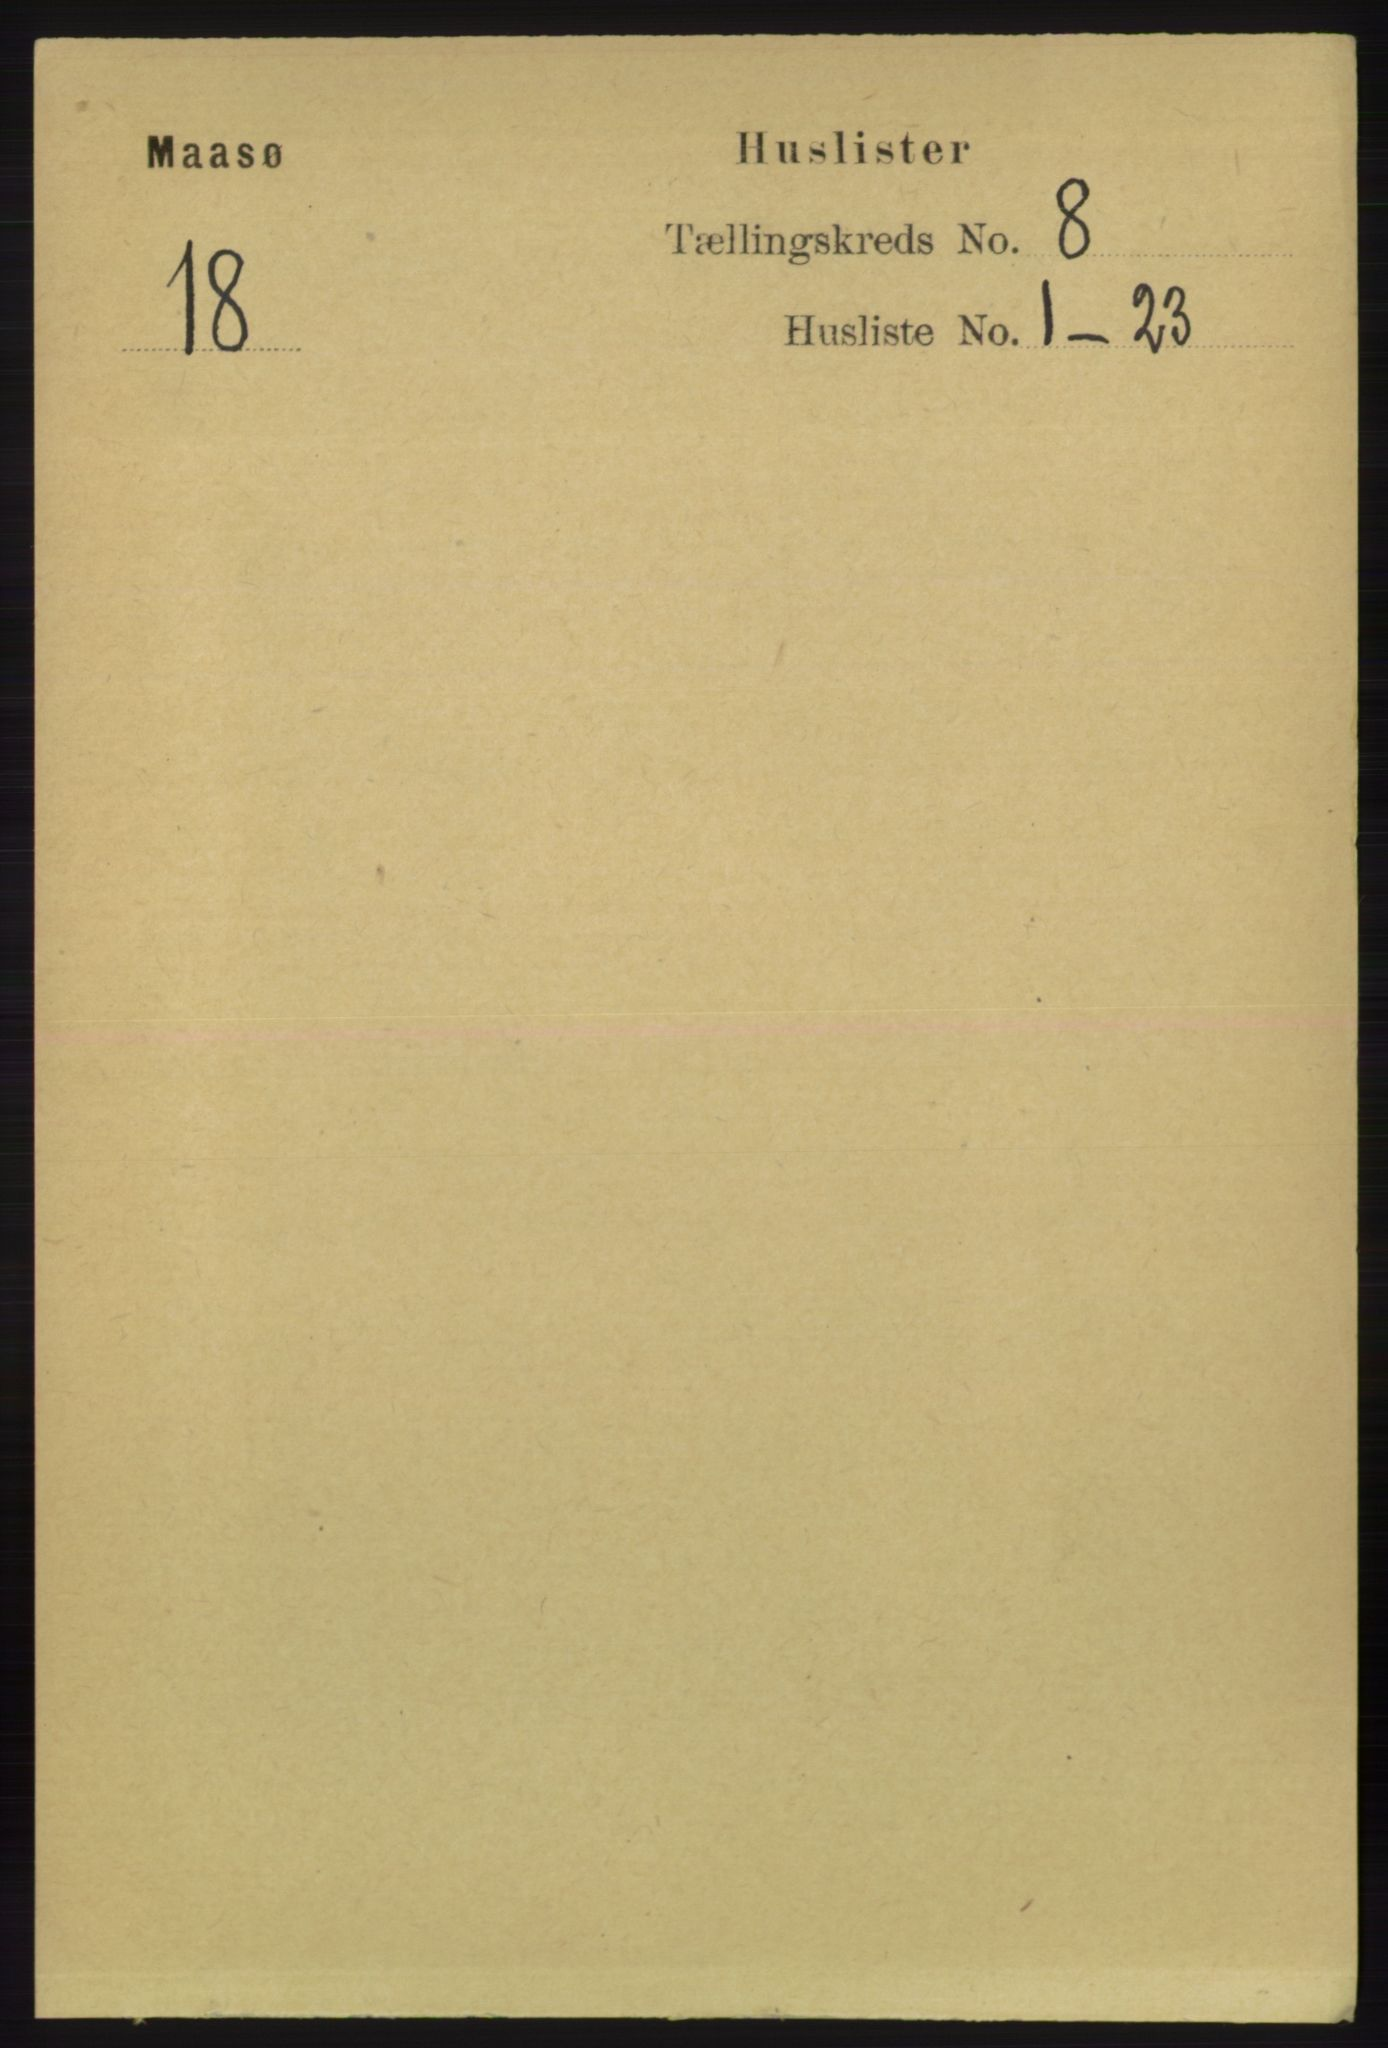 RA, Folketelling 1891 for 2018 Måsøy herred, 1891, s. 1498